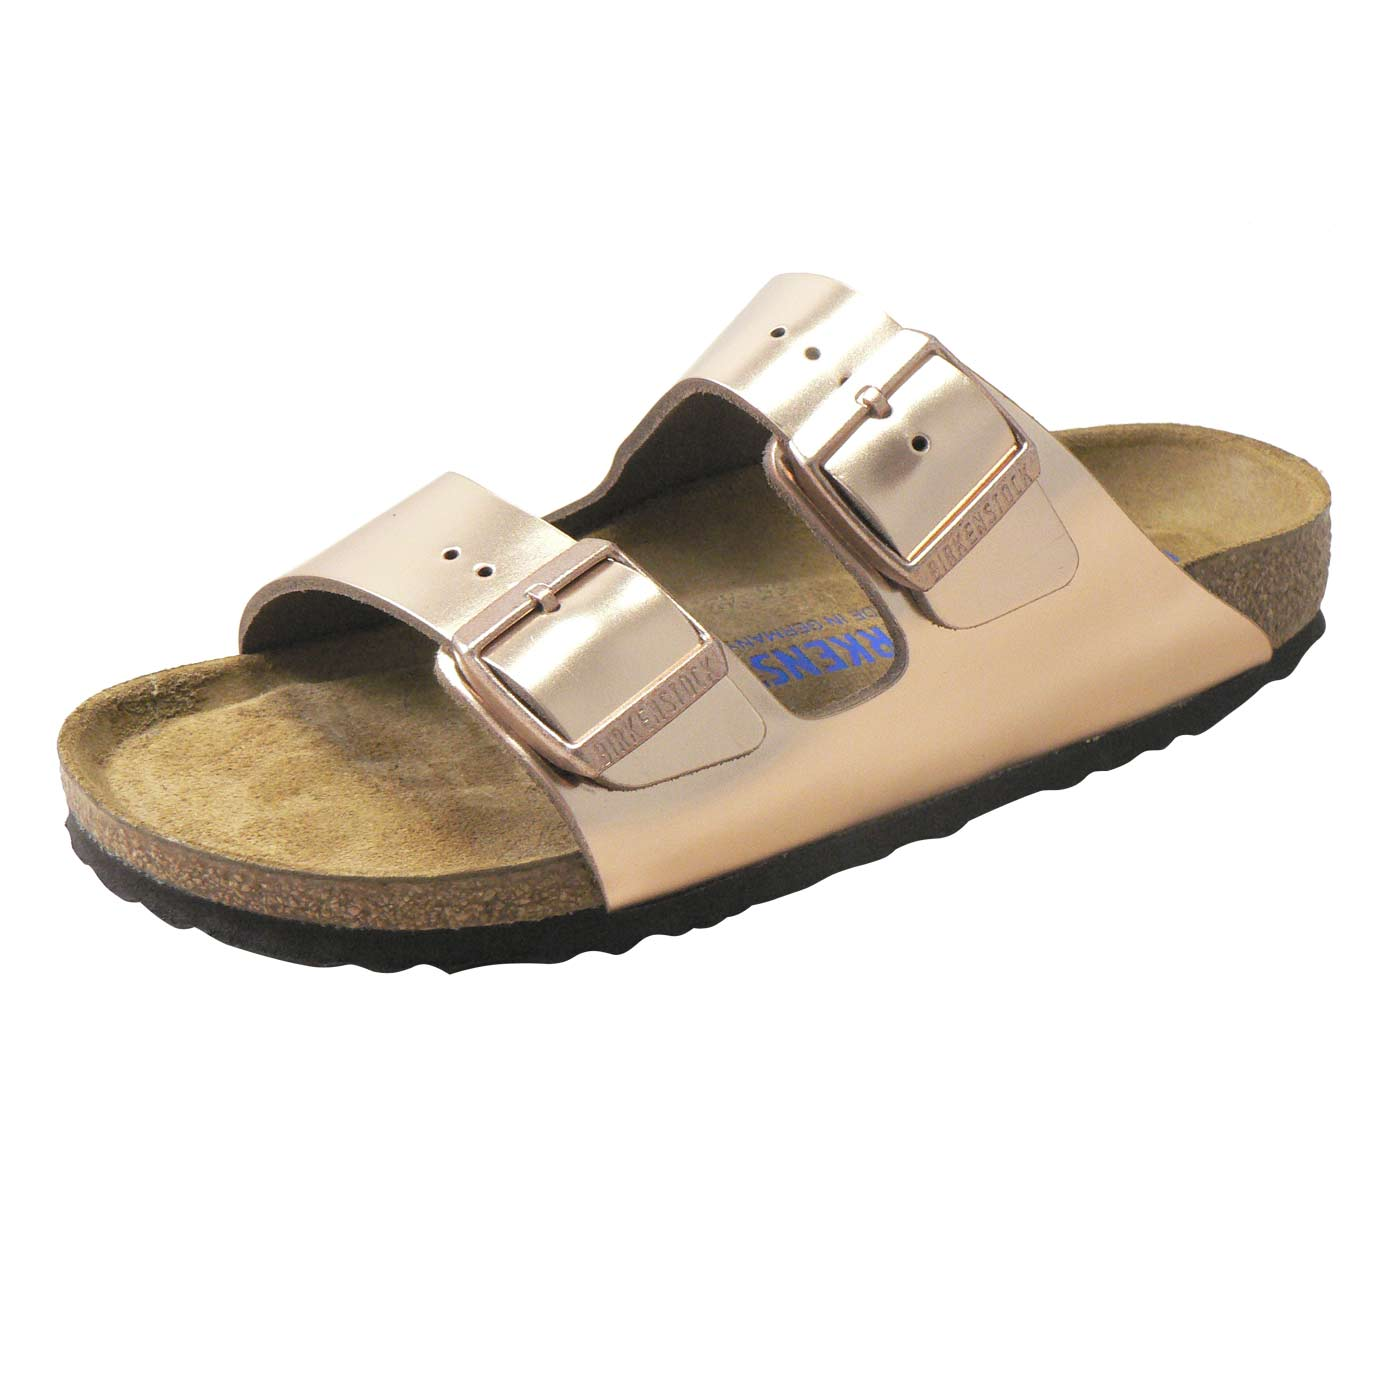 34f883061bc6 Arizona (Natural Leather   Soft Footbed) (NARROW FIT) - Metallic ...